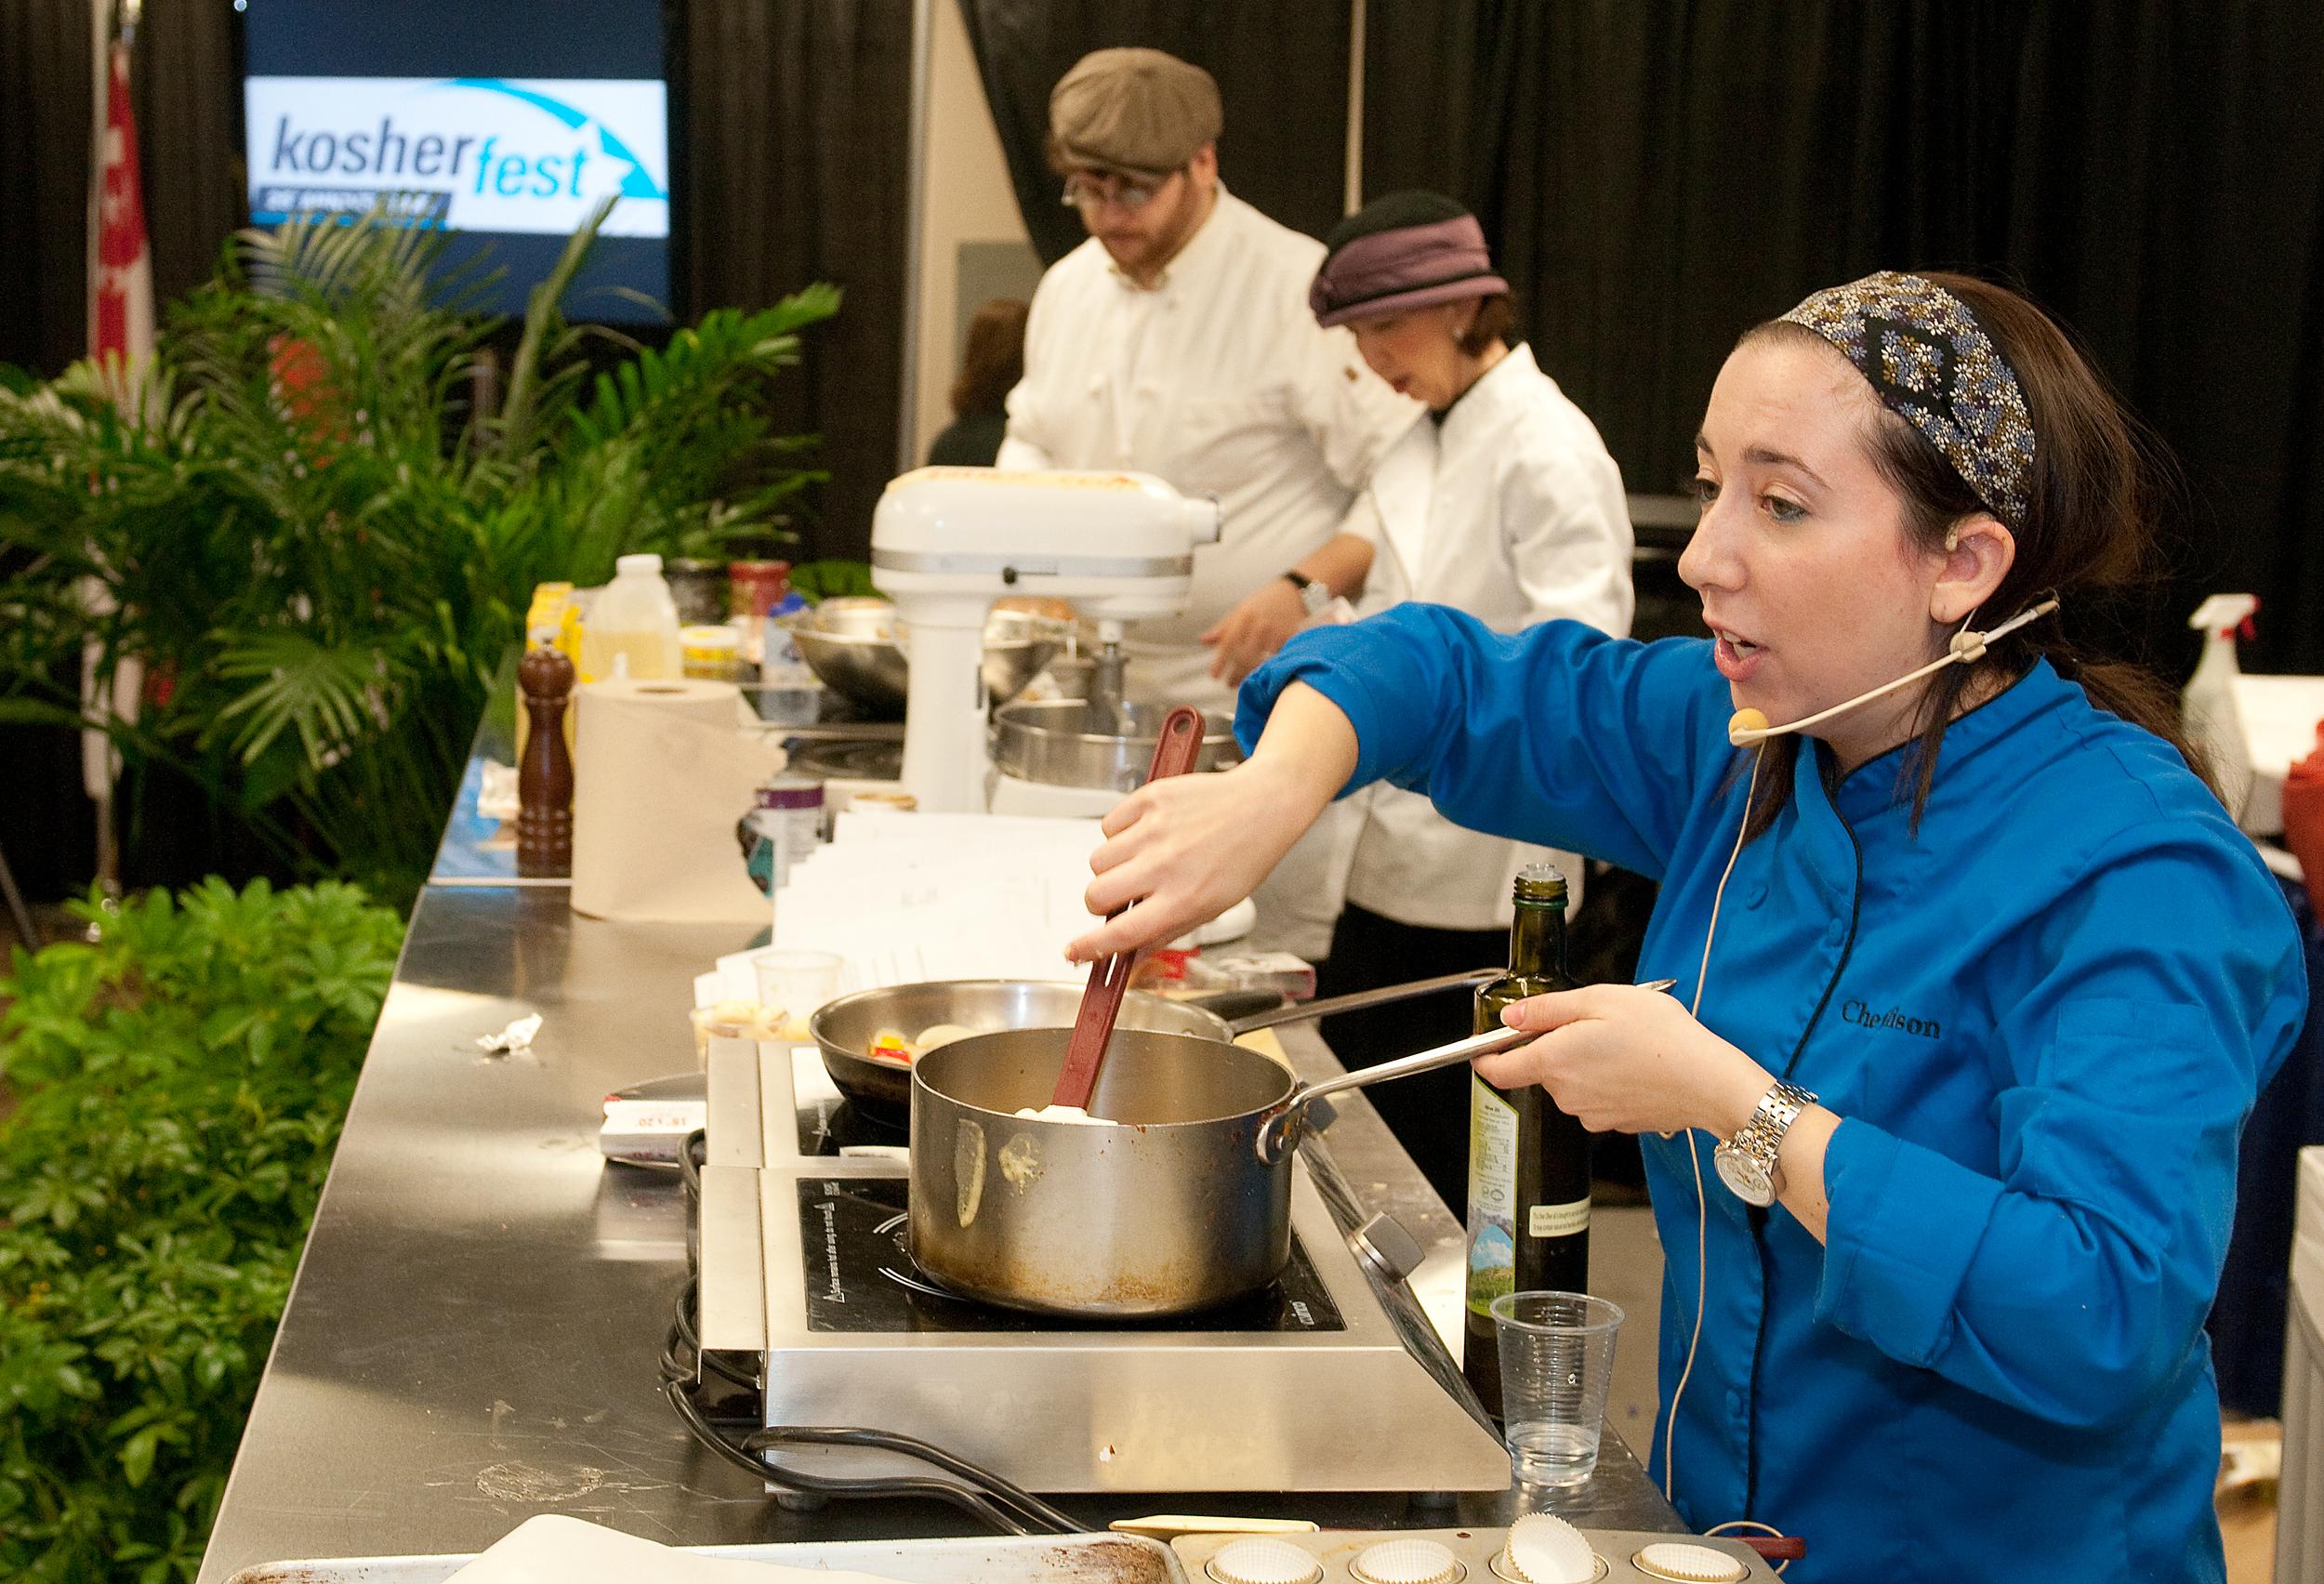 Click photo to download. Caption: A vendor cooks at Kosherfest 2013. Credit: Kosherfest.